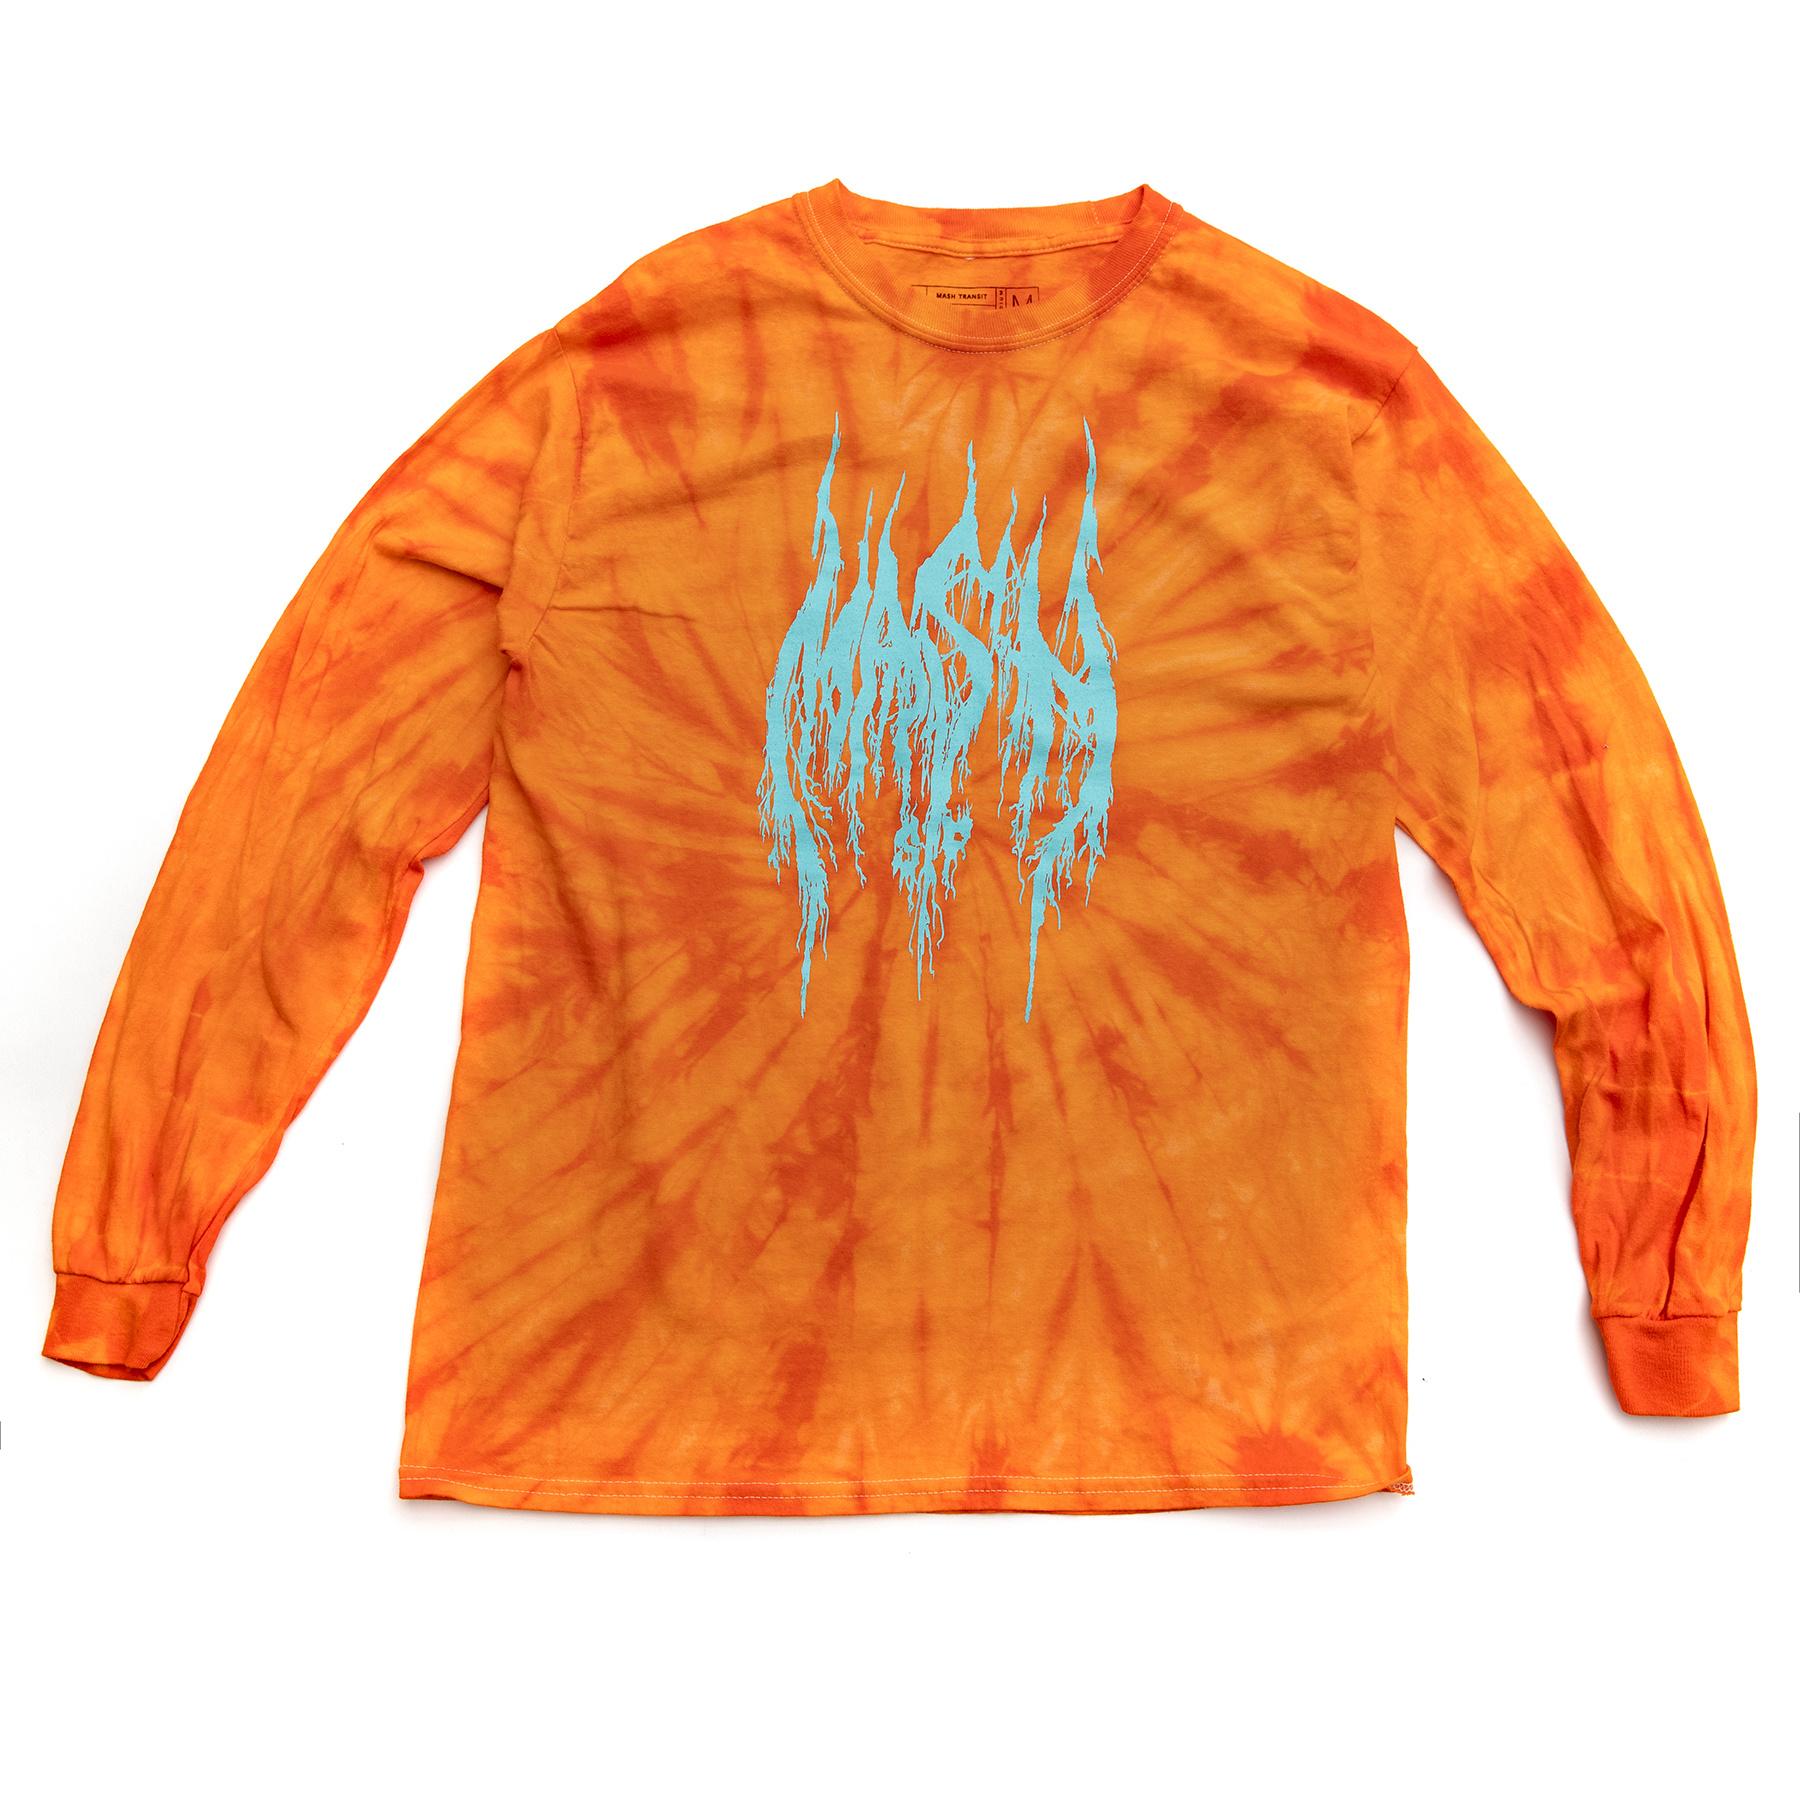 MASH Metal Long Sleeve Orange Spyder Dye